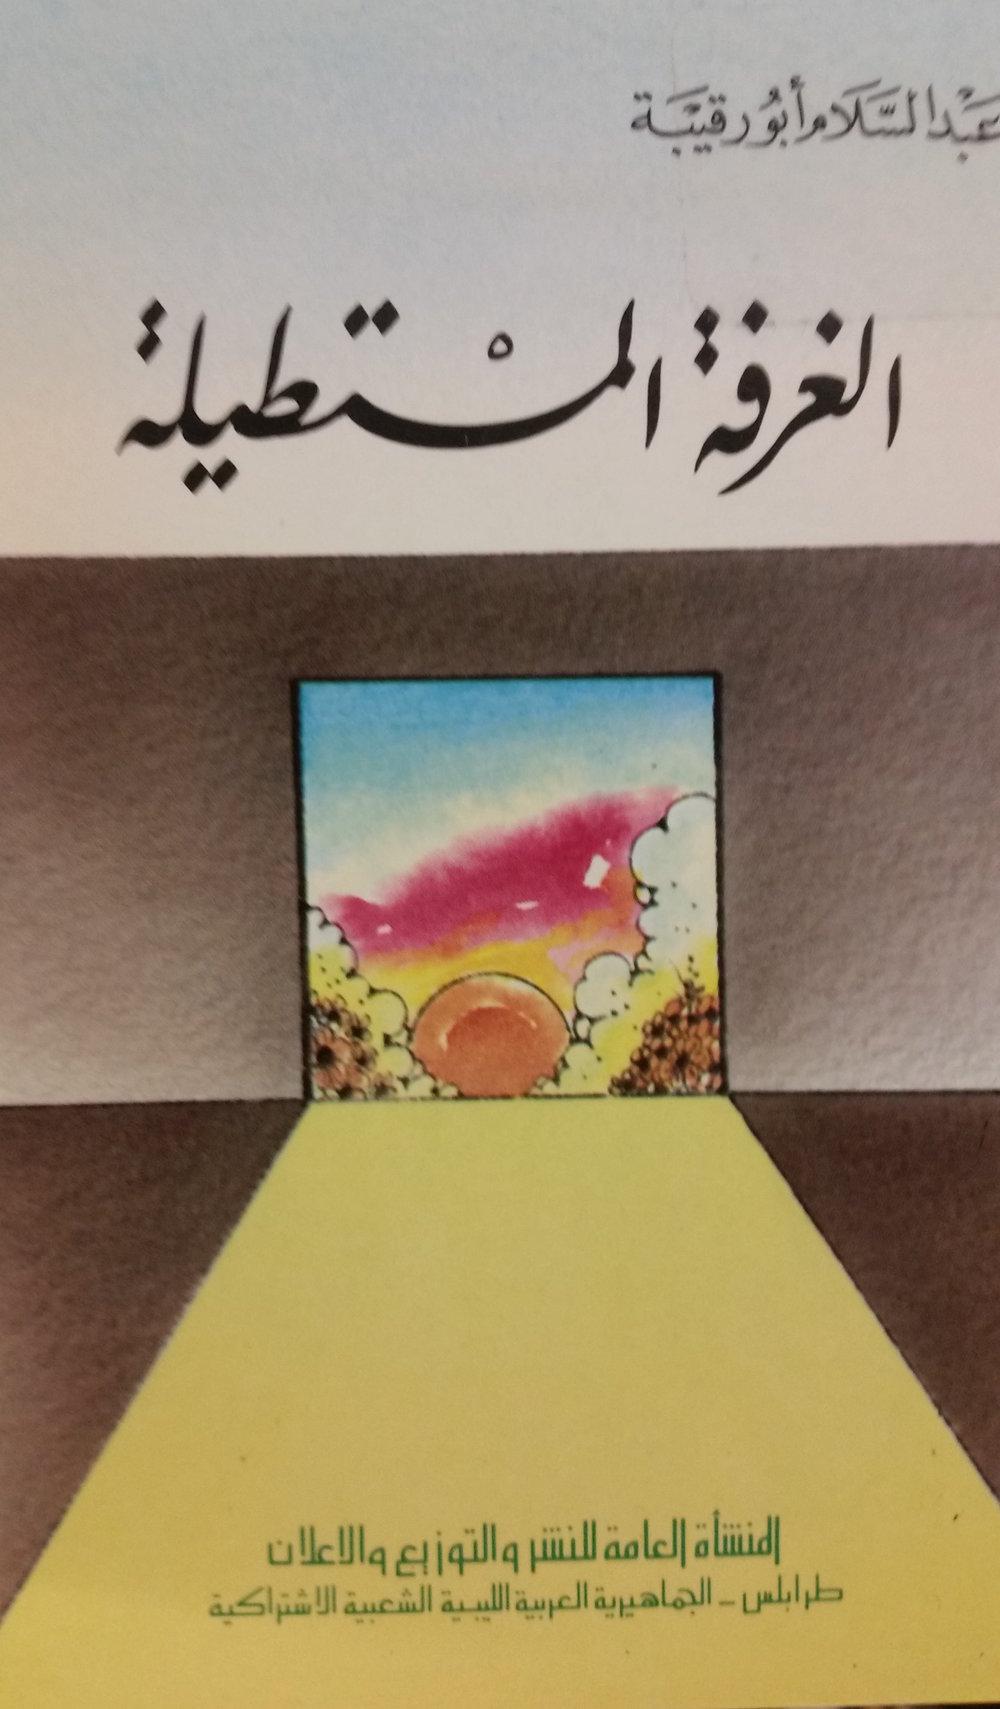 ʻAbd al-Salām Abū Raqībah (Ṭarābulus, al-Jamāhīrīyah al-ʻArabīyah al-Lībīyah al-Shaʻbīyah al-Ishtirākīyah: al-Munsha'ah al-ʻĀmmah li-l-Nashr wa-l-Tawzīʻ wa-l-Iʻlān, 1985)